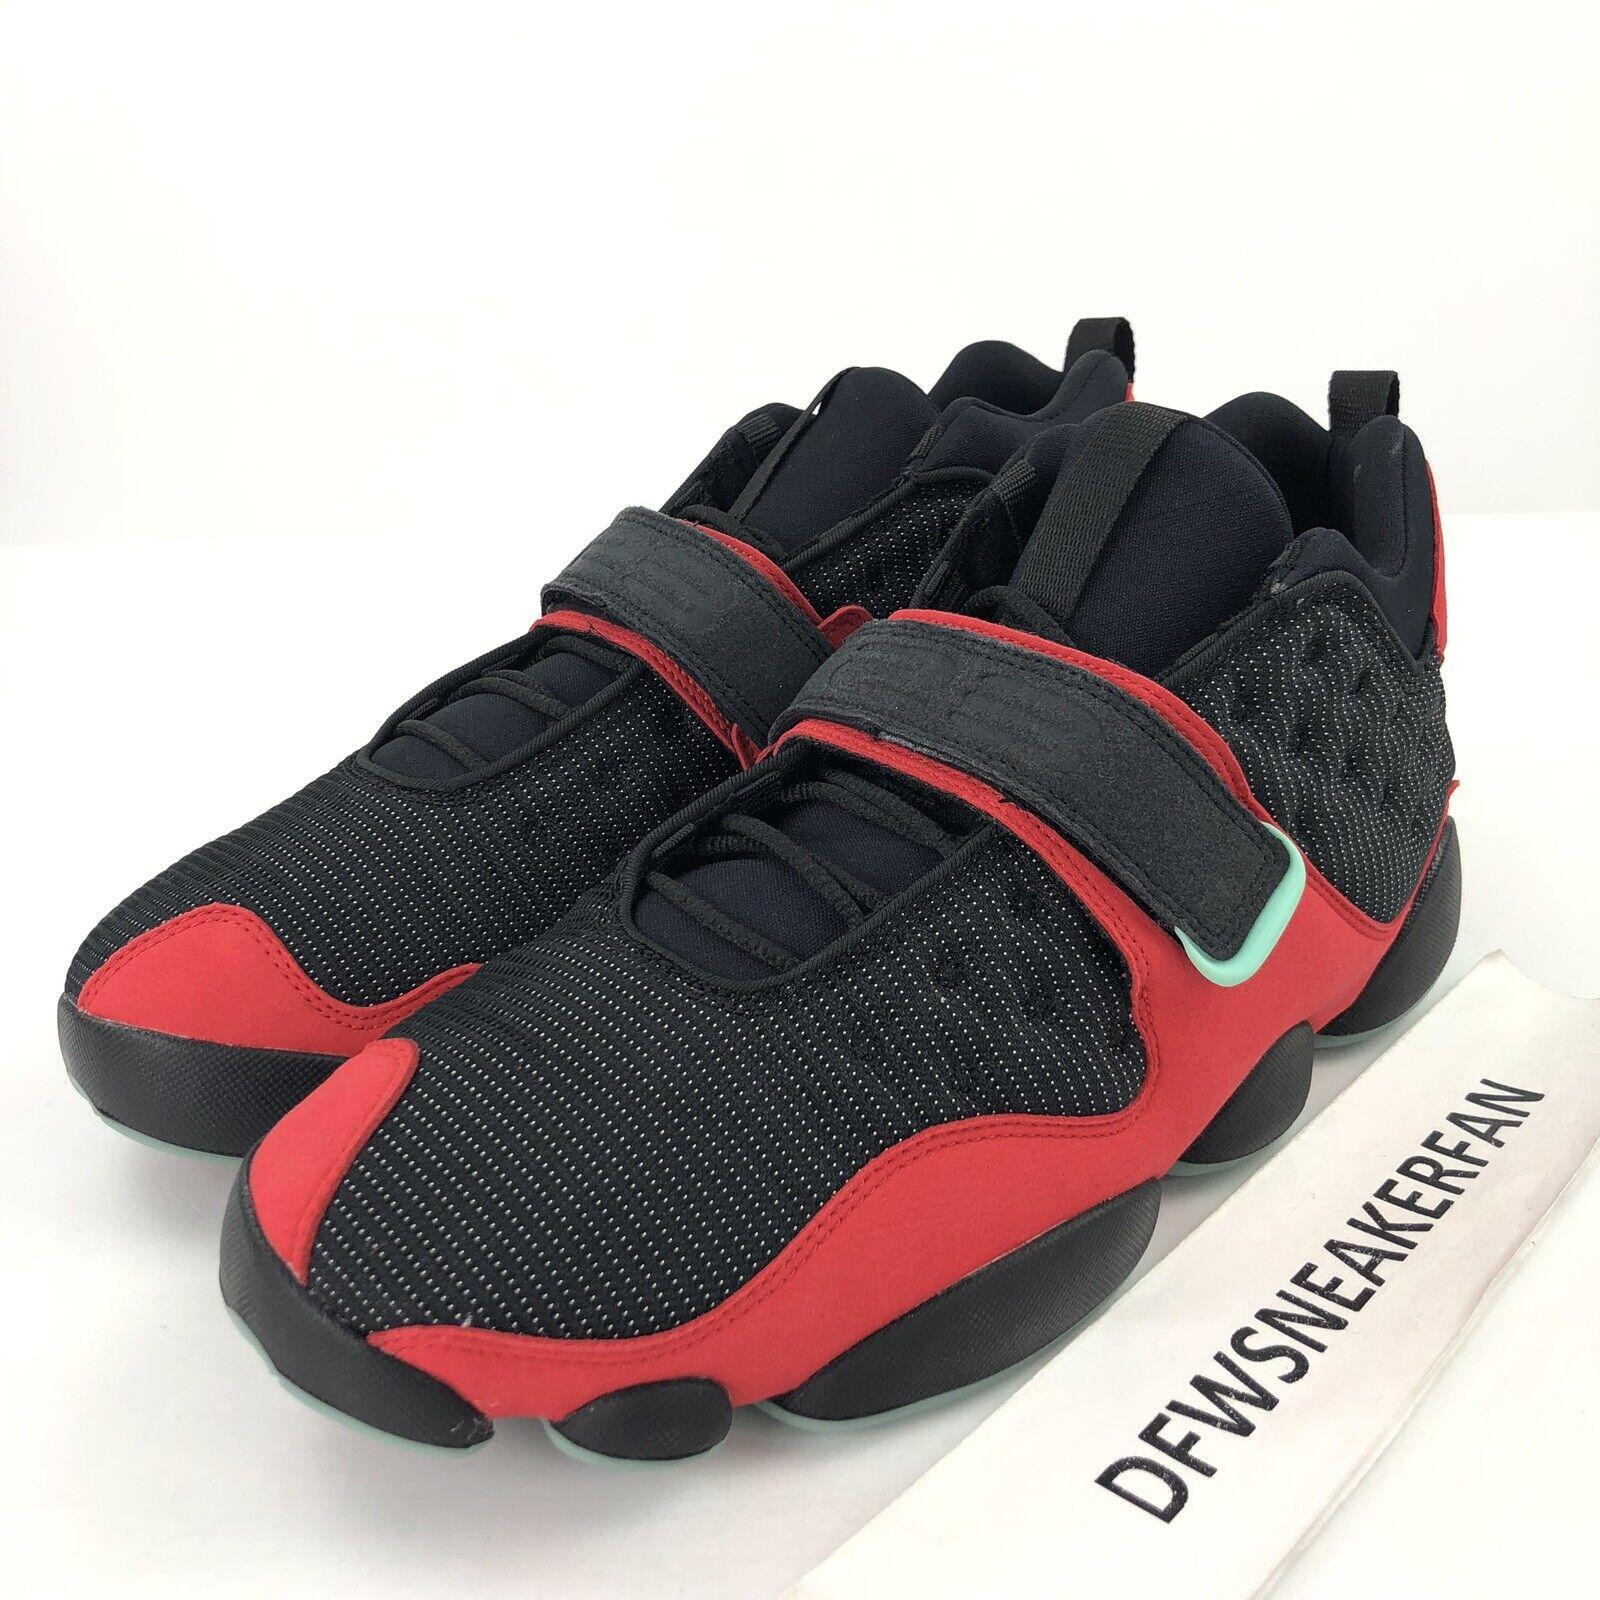 Nike Air Jordan Black Cat Bred Men SZ 10.5 Black Red Tinker Hatfield AR0772-006